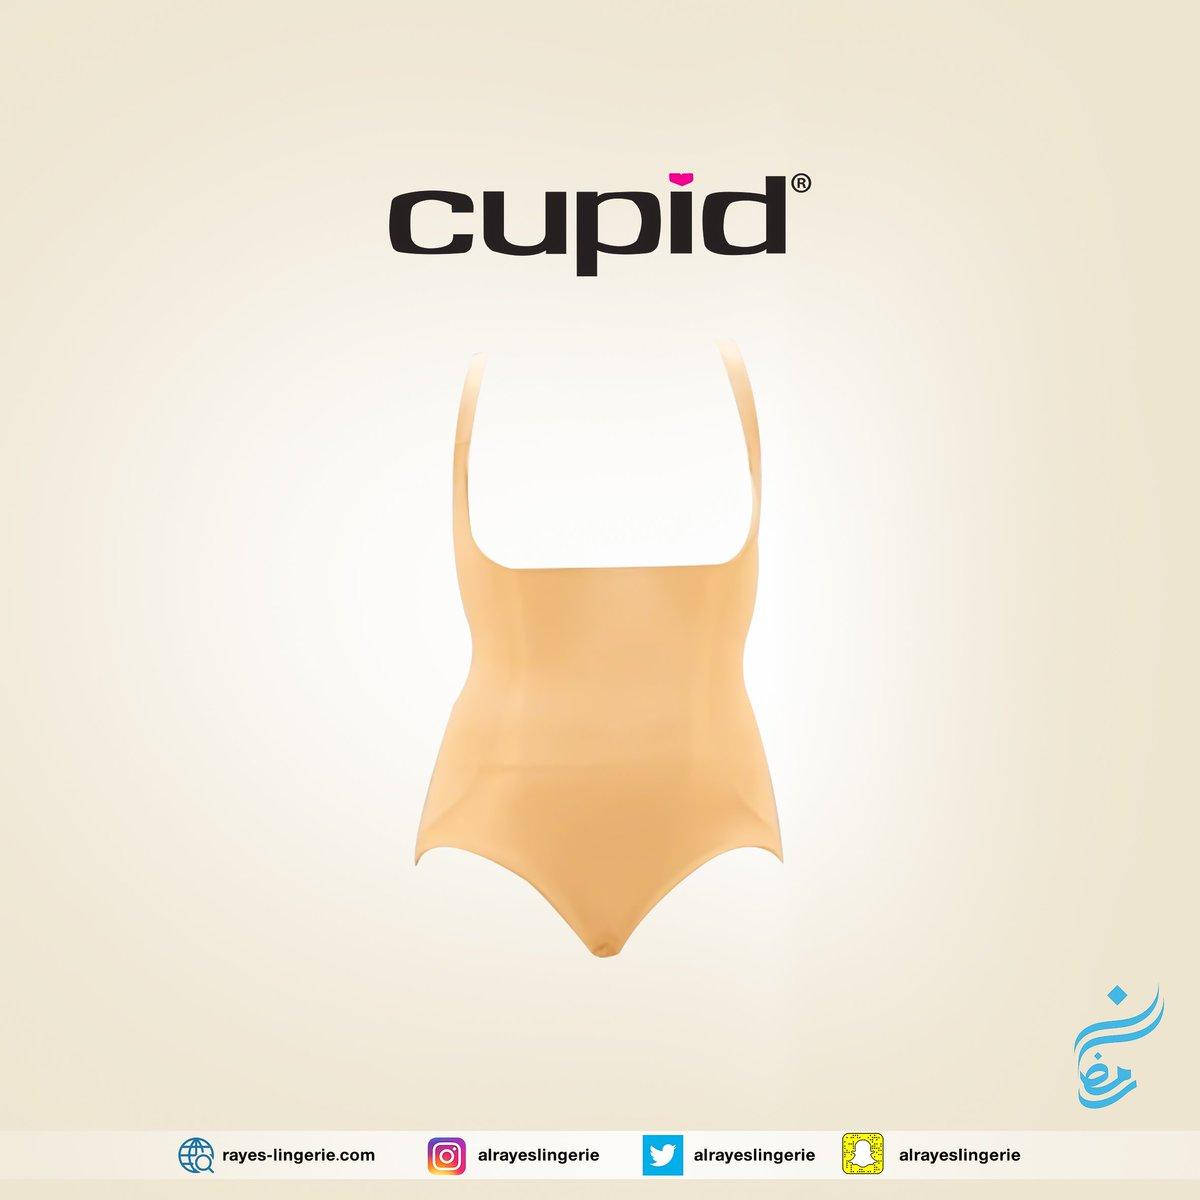 cc728d0156490 CUPID INTIMATES 2918N مشد كامل بدون حاملة صدر يشد البطن ويرتب الجسم متوفر  باللون اللحمي - السعر 220 ريالpic.twitter.com jakgUu3FLe